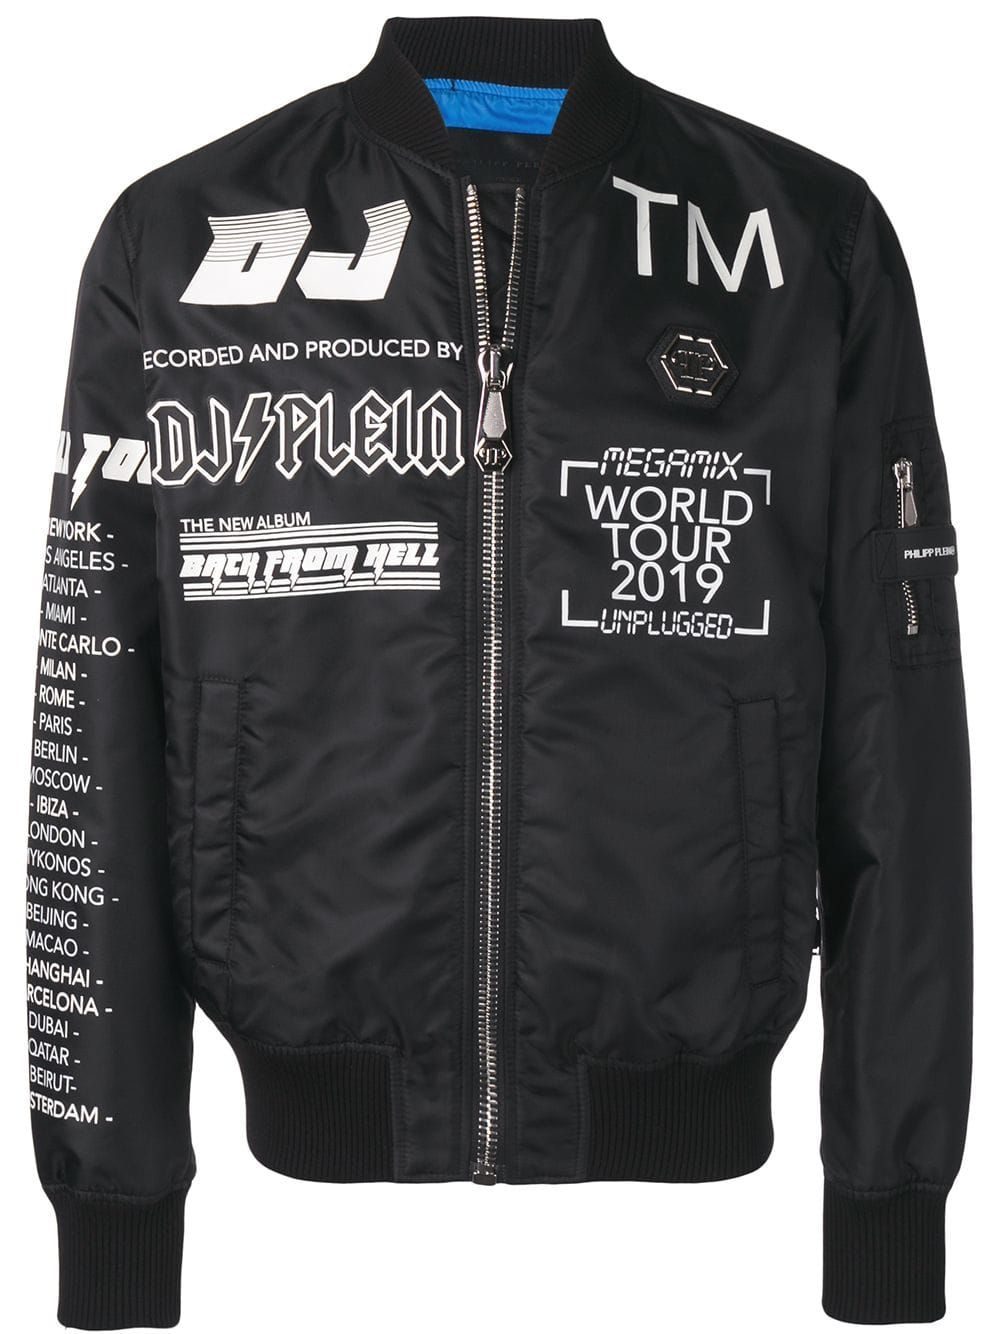 Philipp Plein Philipp Plein Slogan Detail Bomber Jacket Black Philippplein Cloth Black Bomber Jacket Bomber Jacket Jackets Men Fashion [ 1334 x 1000 Pixel ]